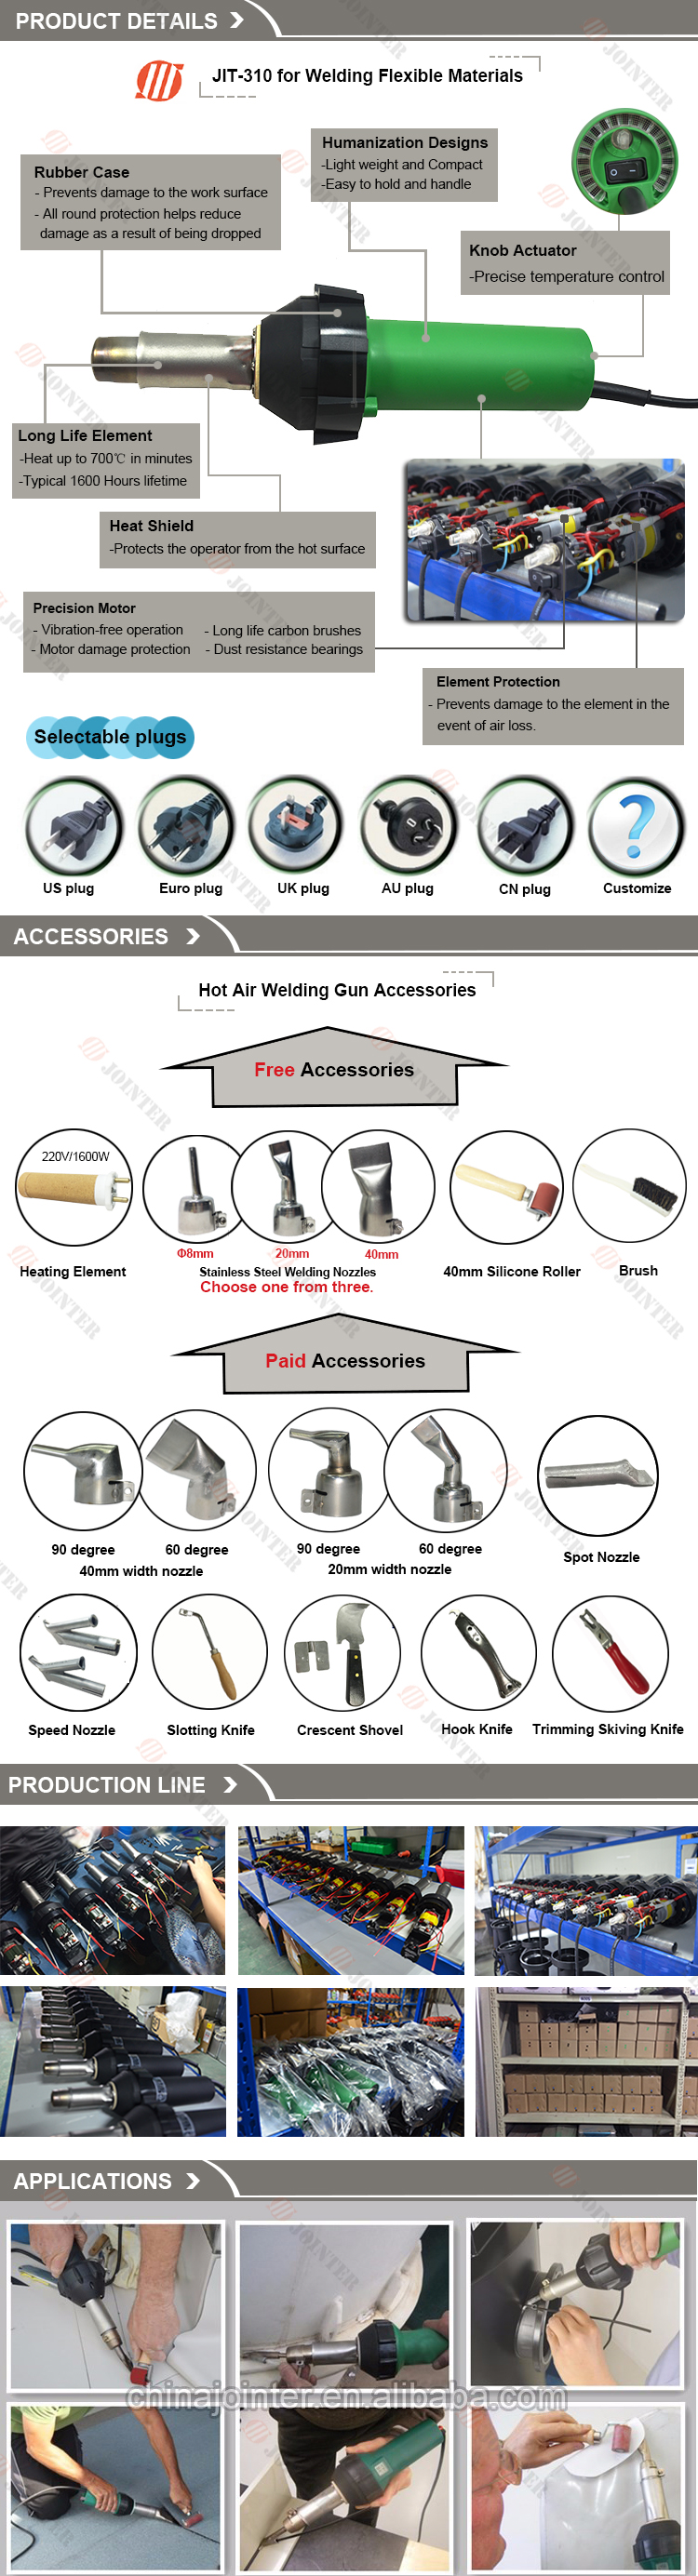 PVC Hot Air Blower Plastic Soldering Gun with 1600W Heating Element